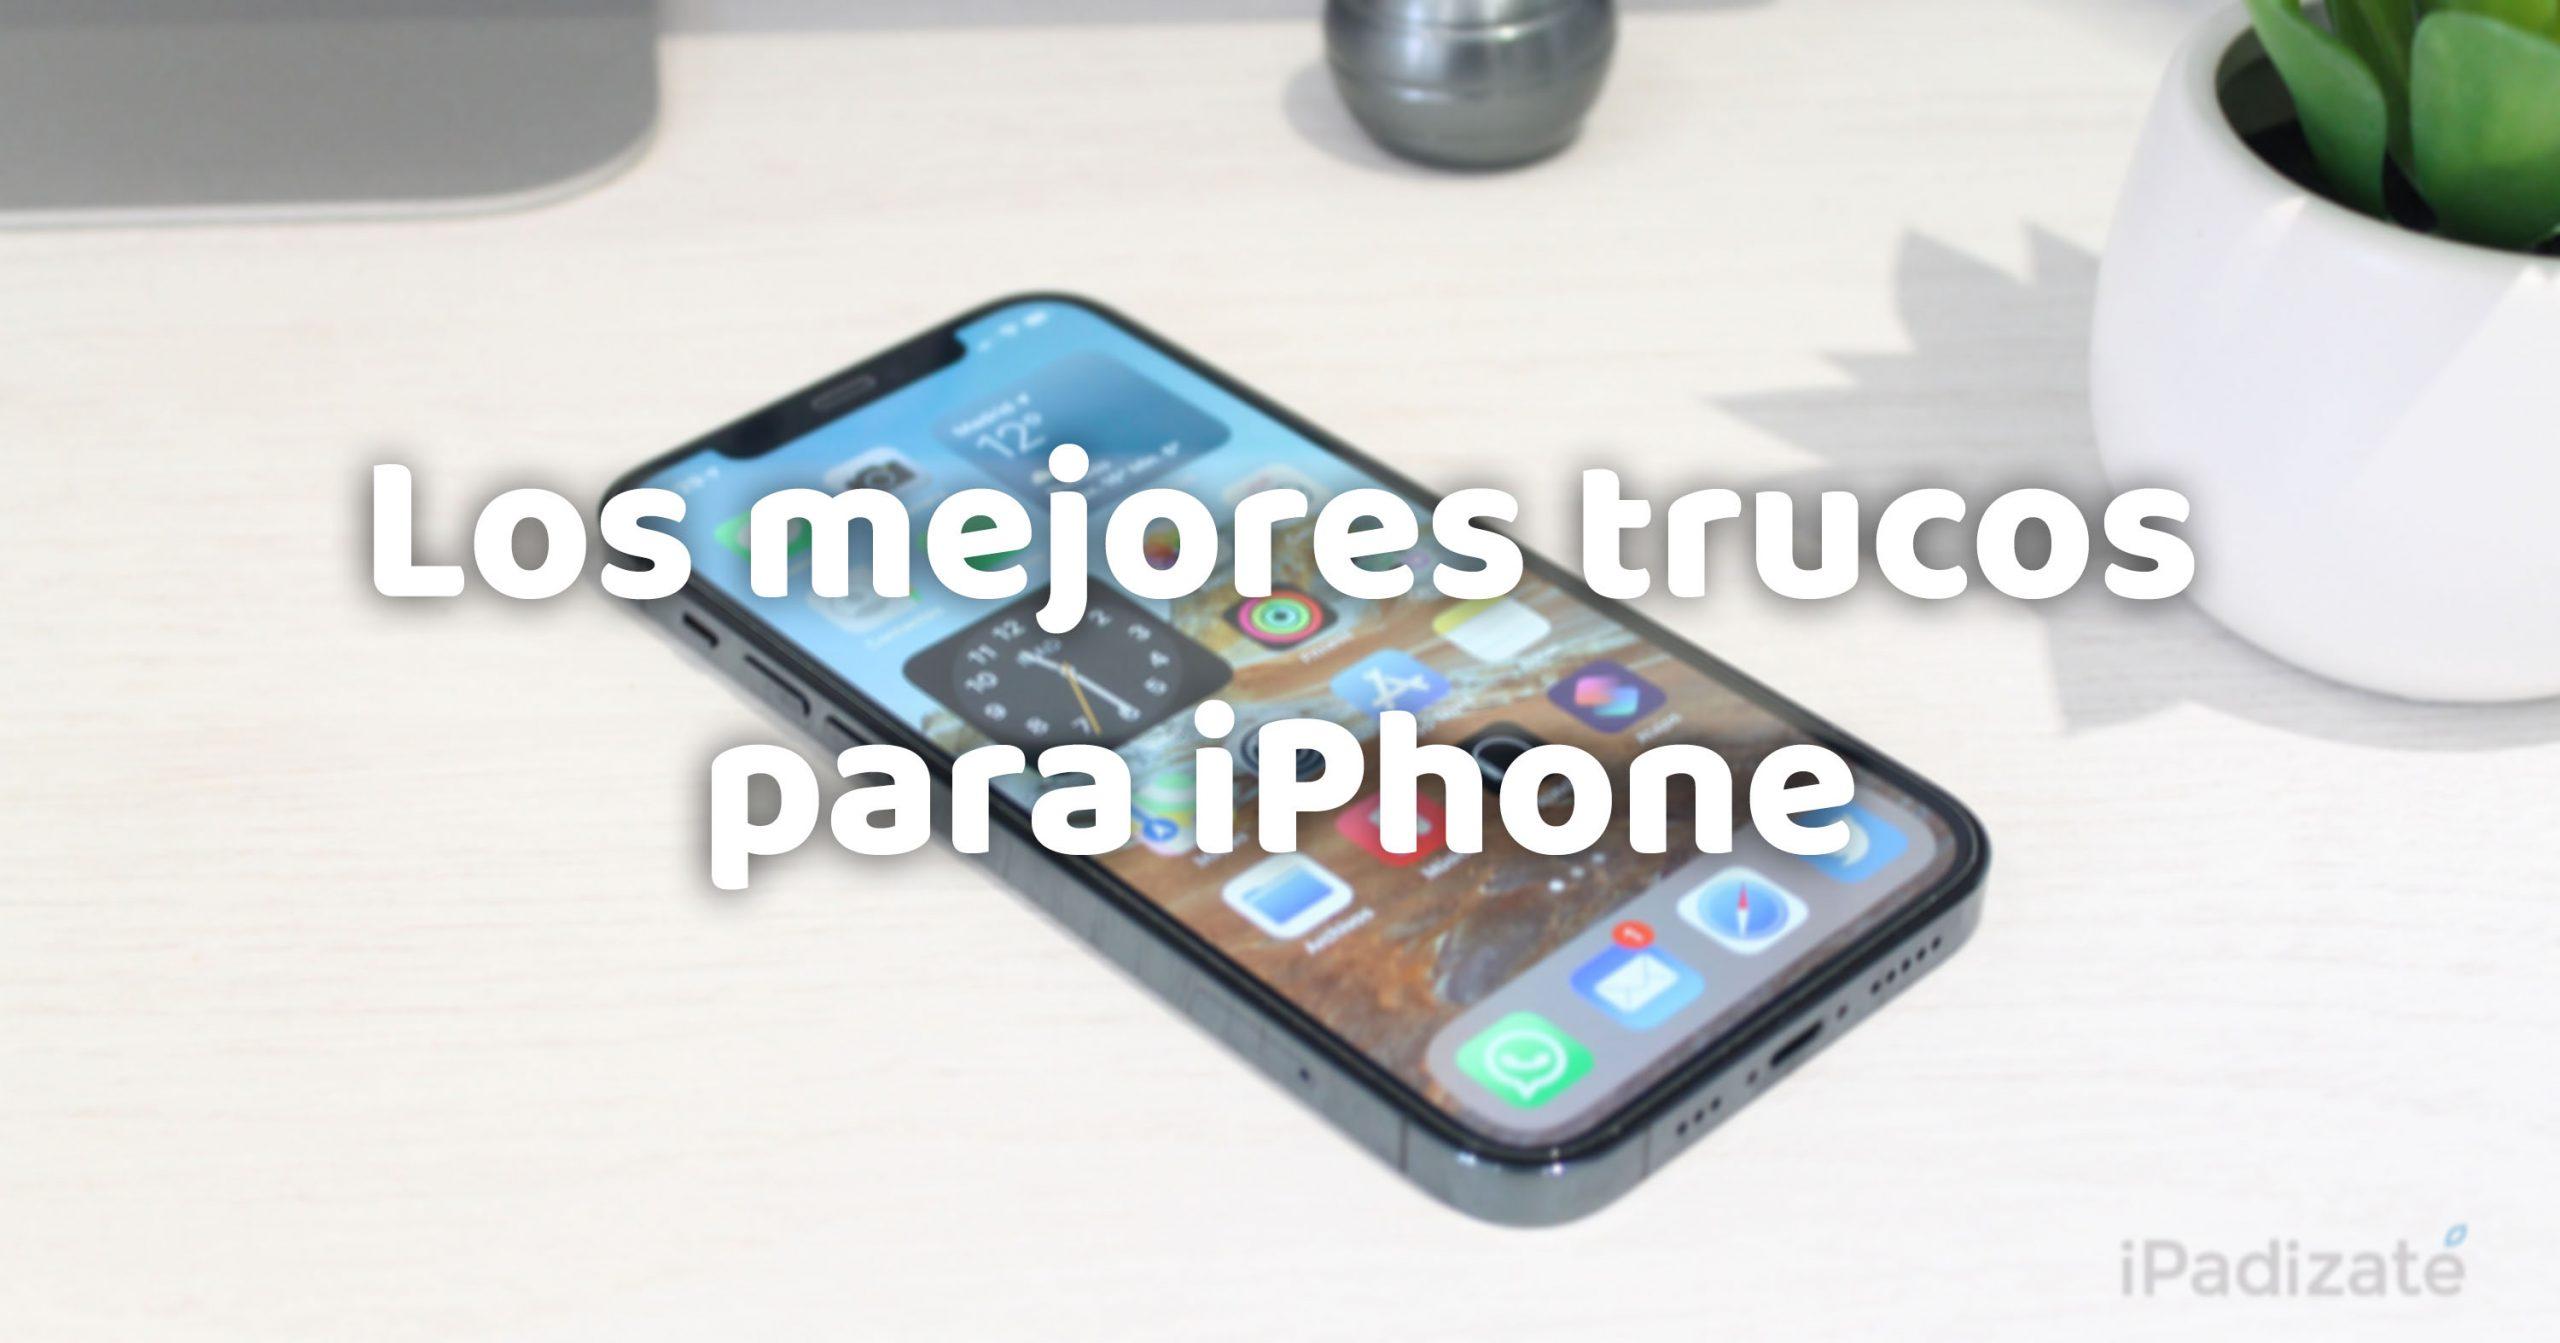 Trucos para iPhone que no conocías y deberías usar